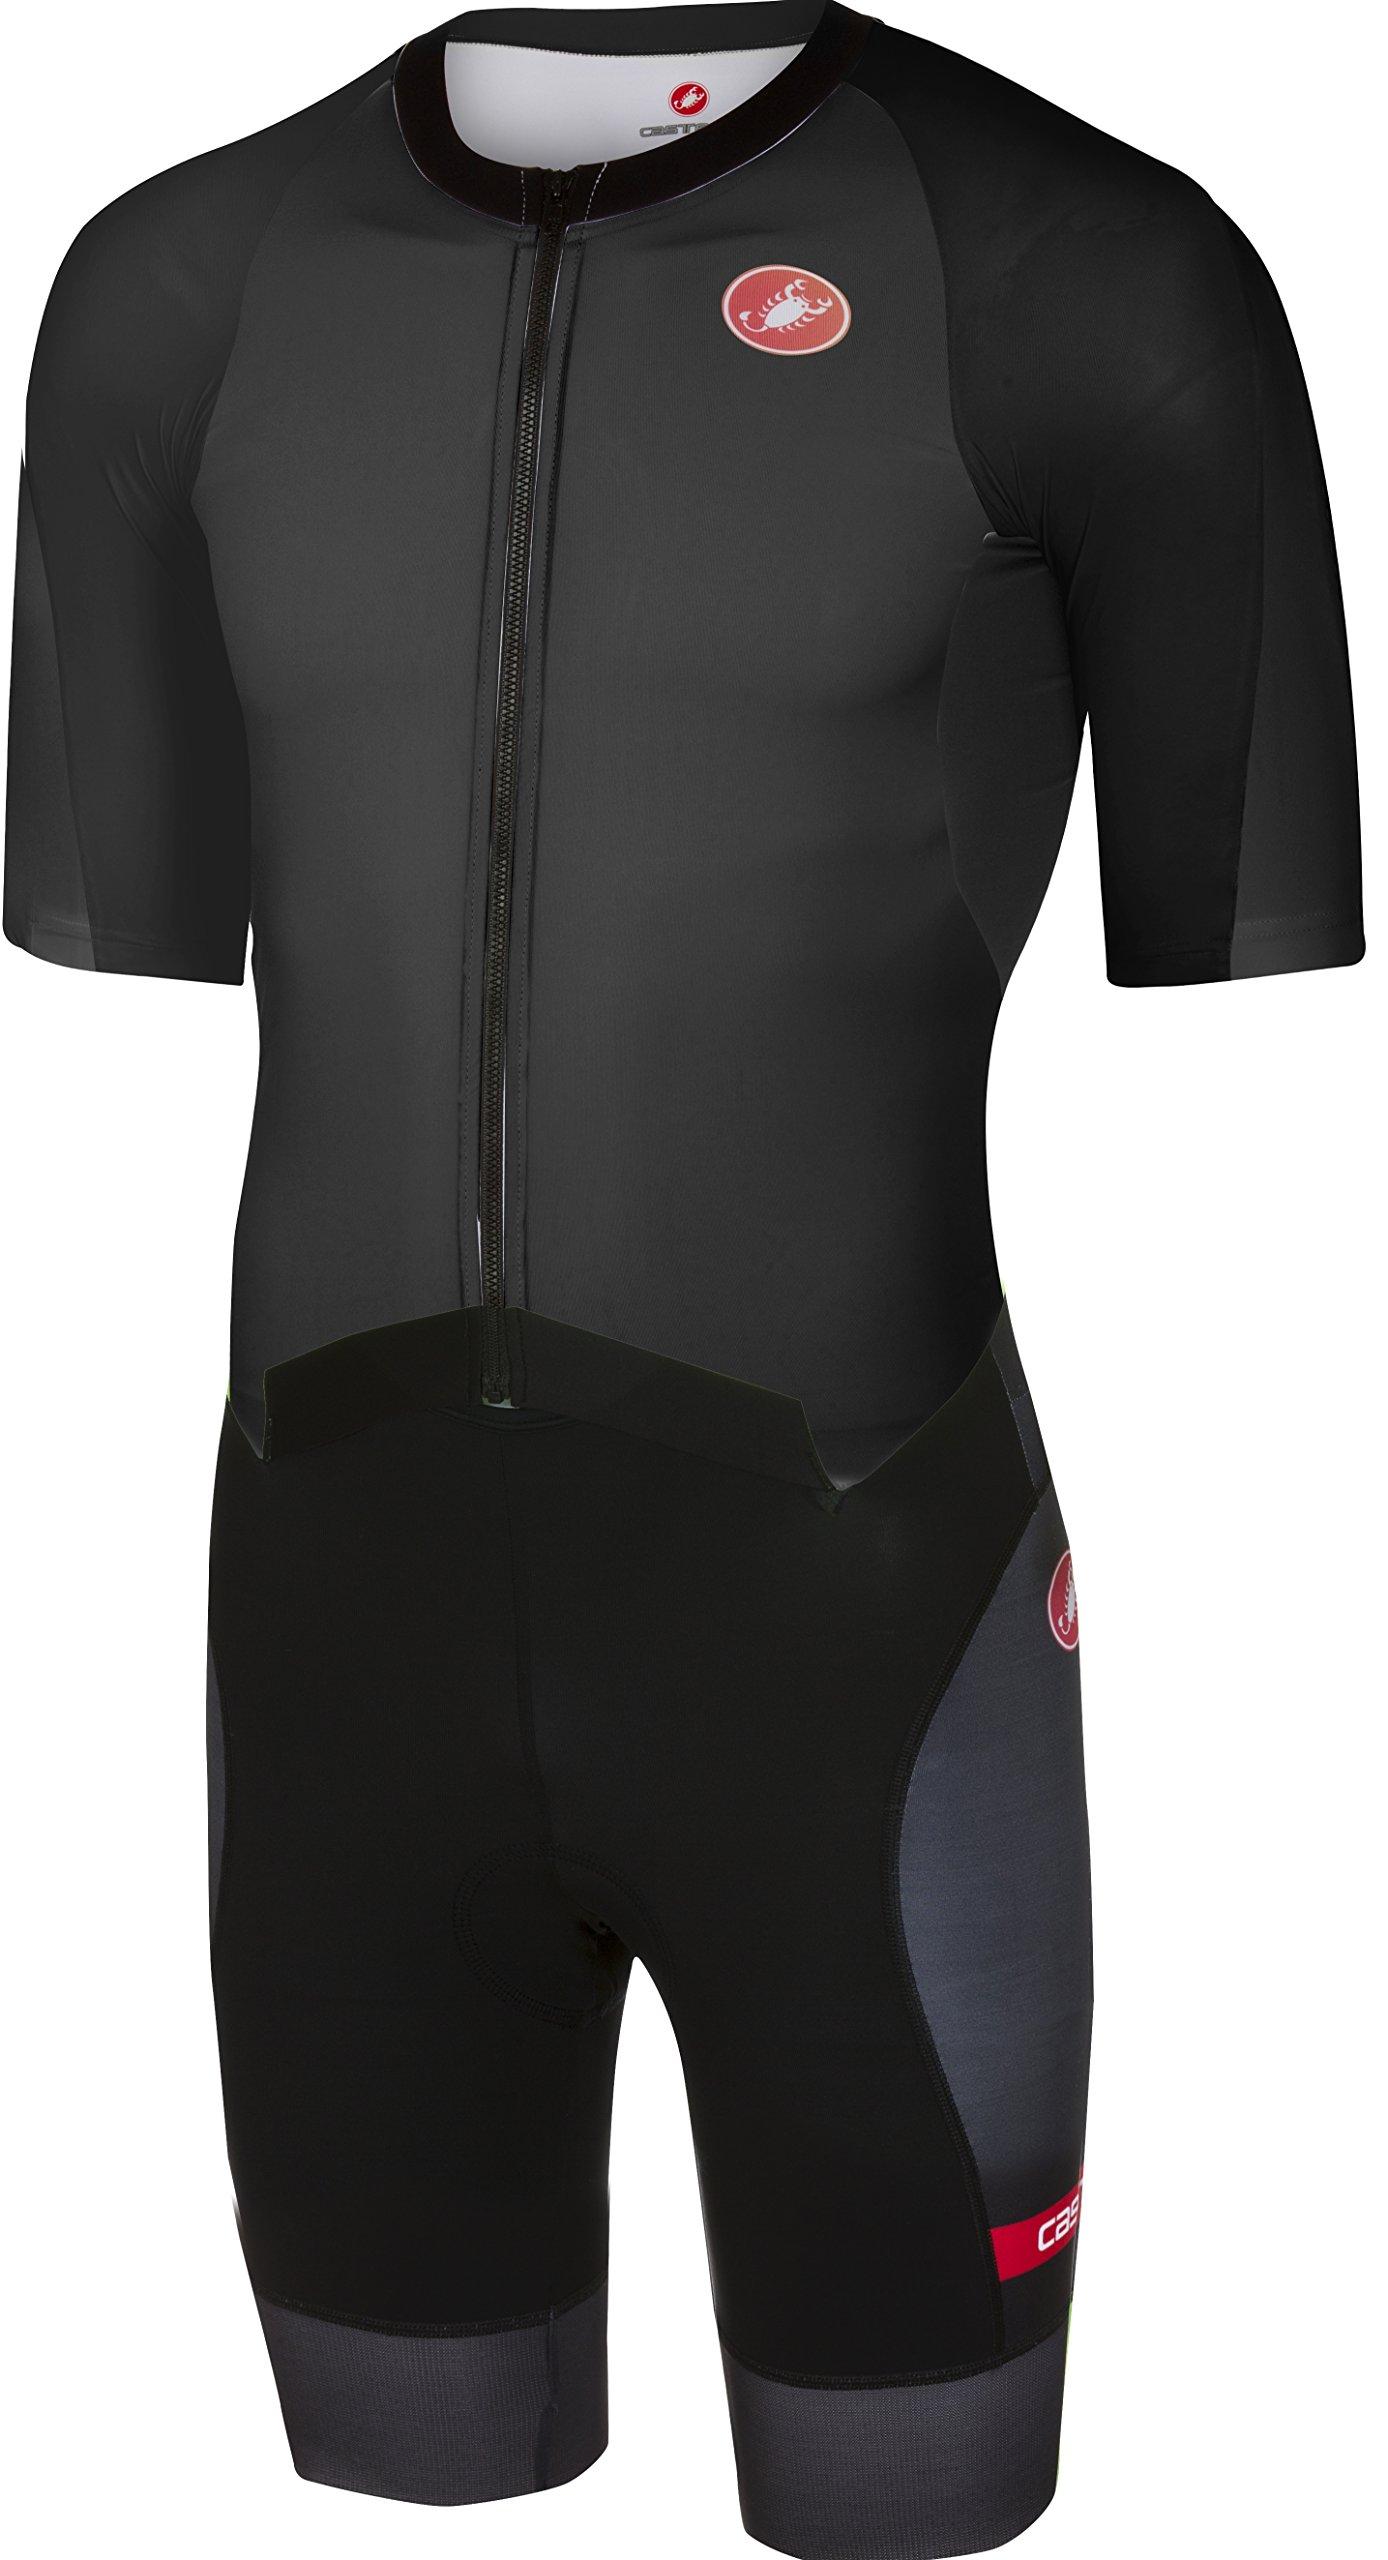 Castelli All Out Speed Suit - Men's Black, M